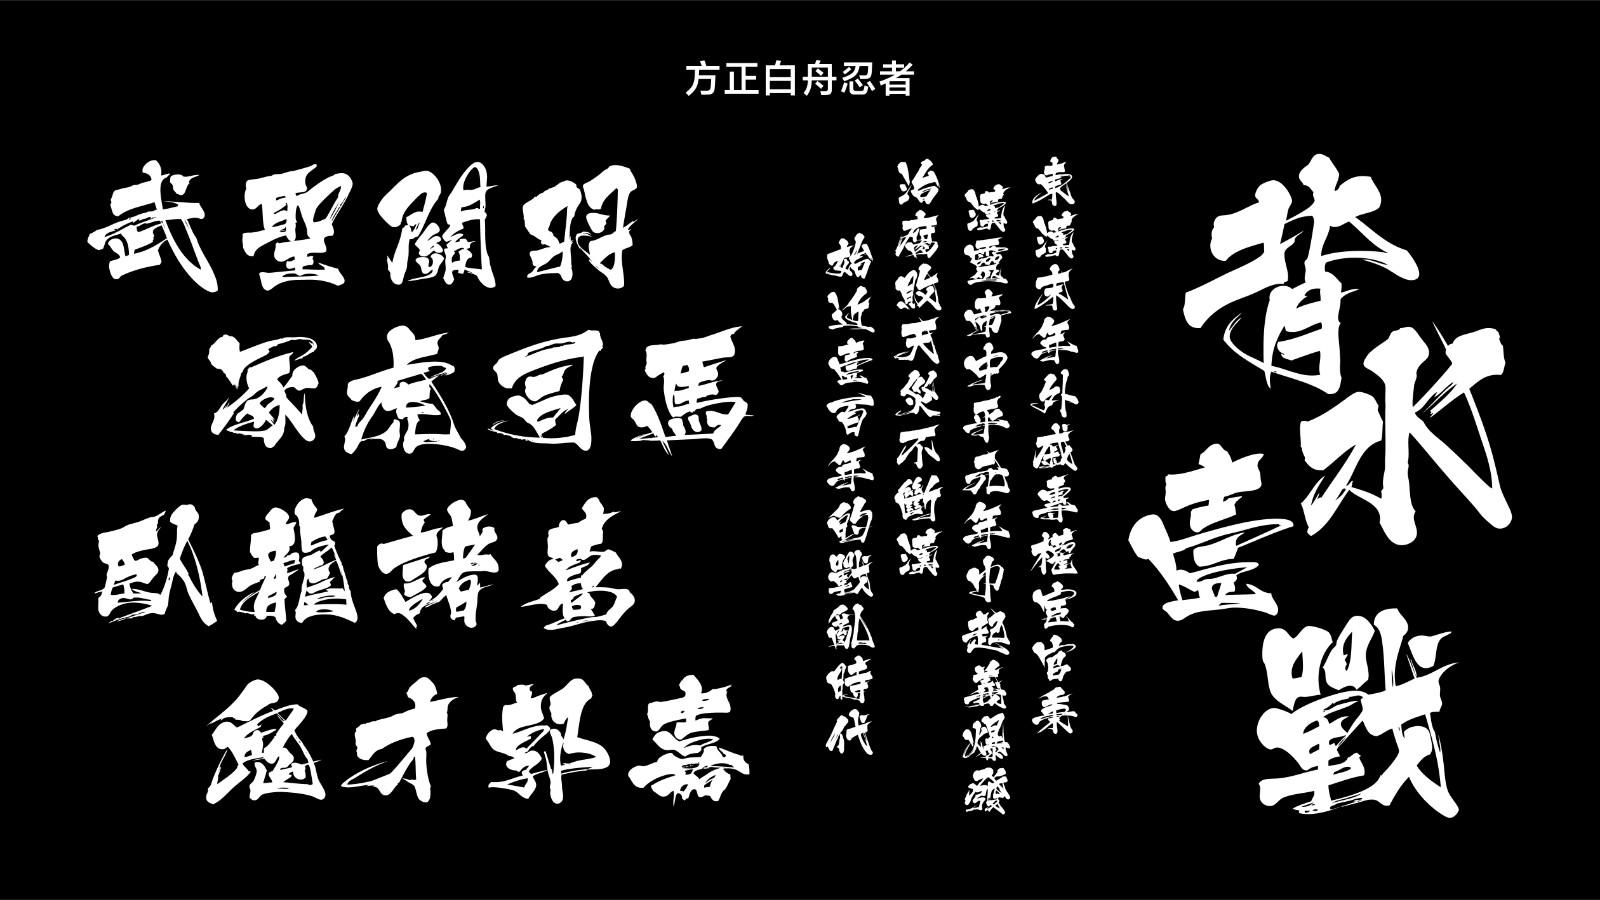 https://ft-bk1.oss-cn-zhangjiakou.aliyuncs.com/Public/Uploads/img/n_content_20201210180158_9687.jpg